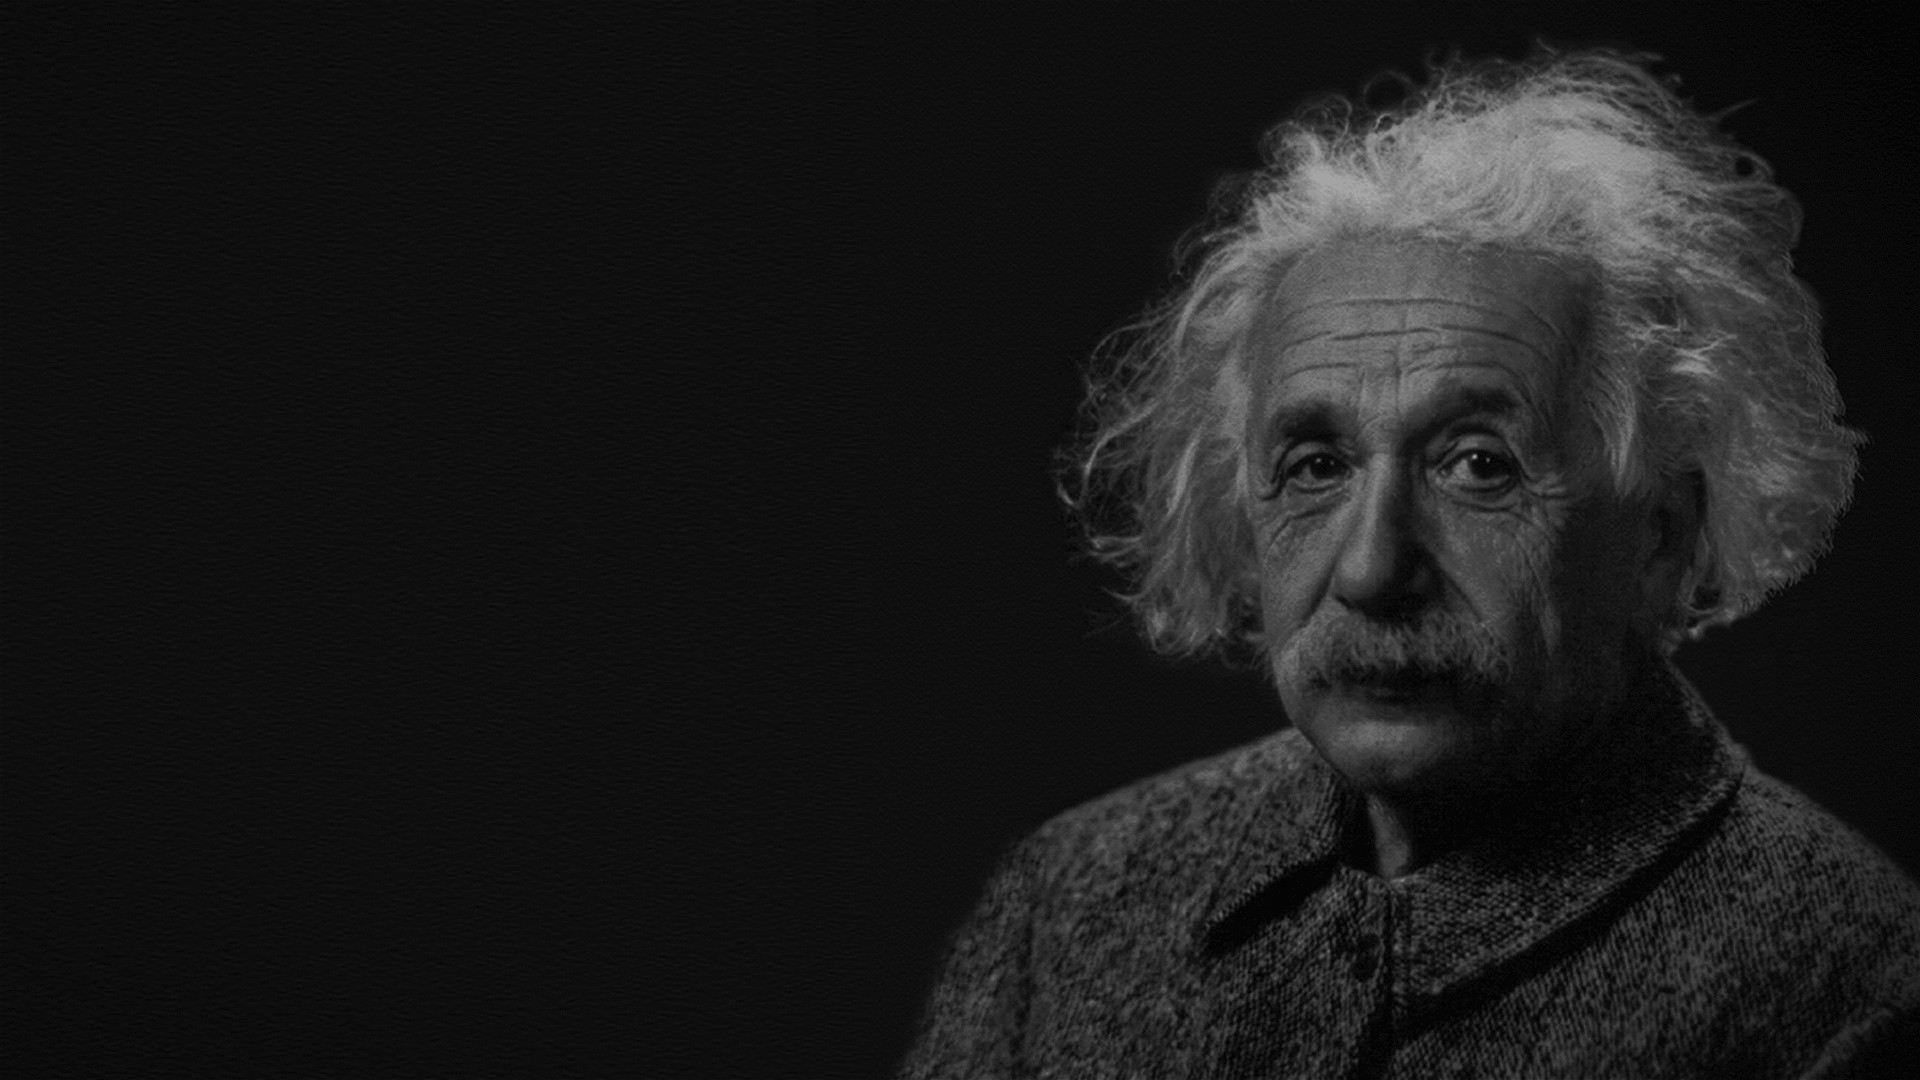 Albert Einstein desktop wallpaper download